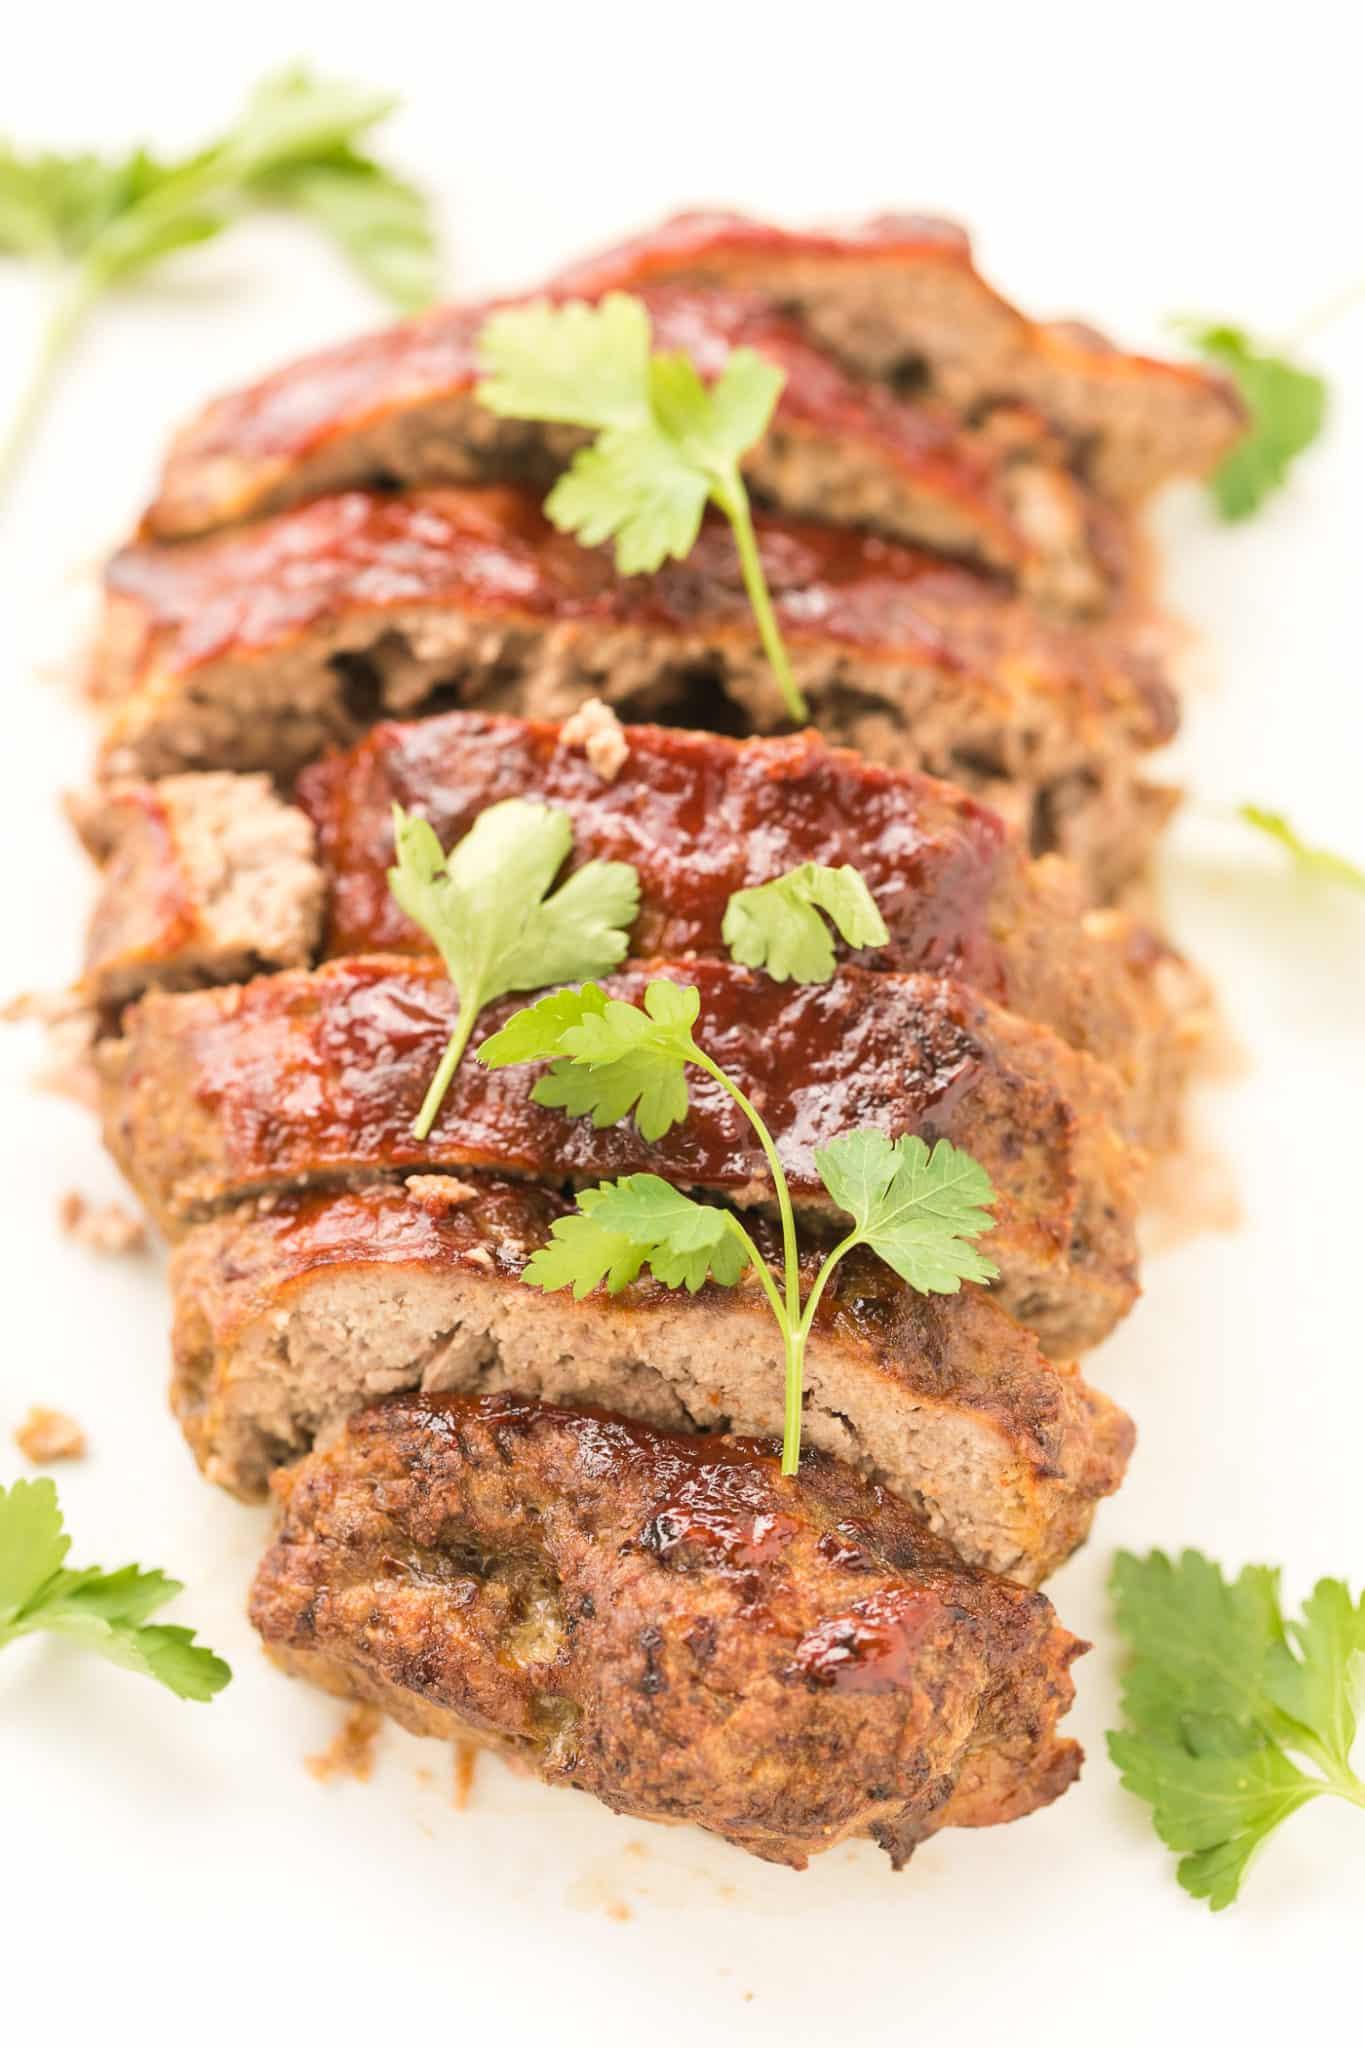 sliced air fryer meatloaf with a sprinkle of parsley on top